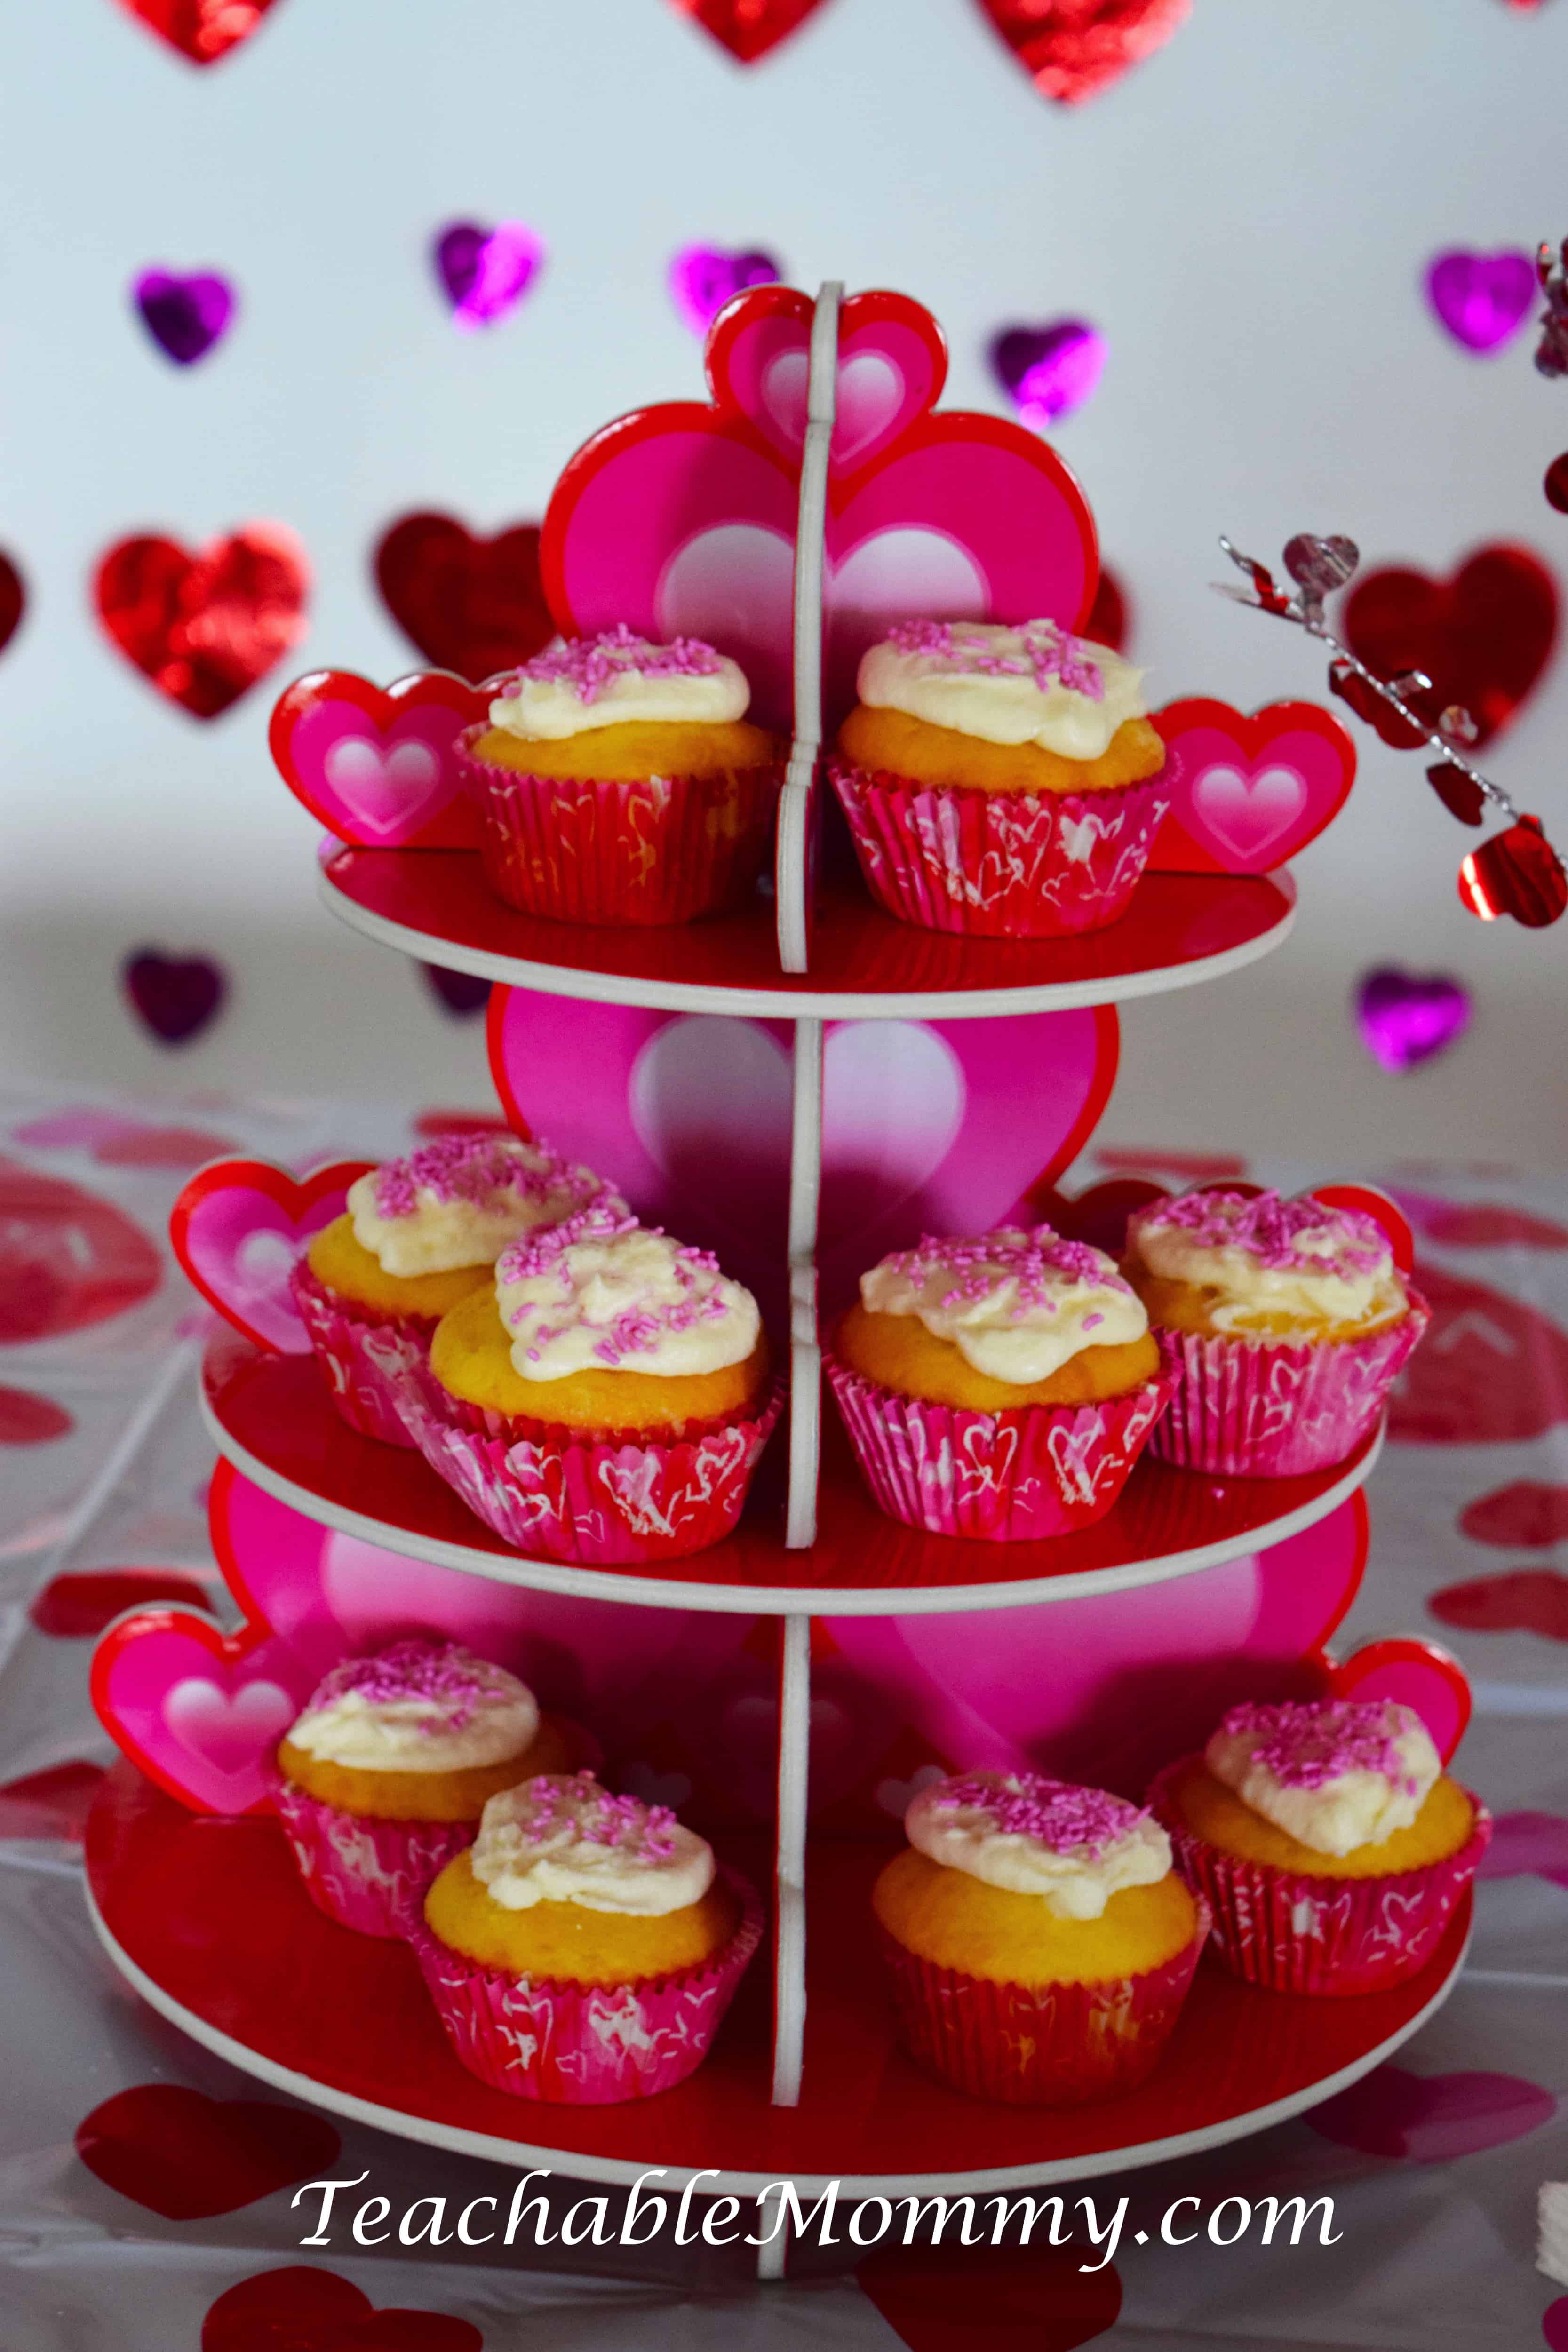 Valentineu0027s Day Party Ideas, Valentineu0027s Day Party, Valentineu0027s Day, Free  Valentineu0027s Printable,